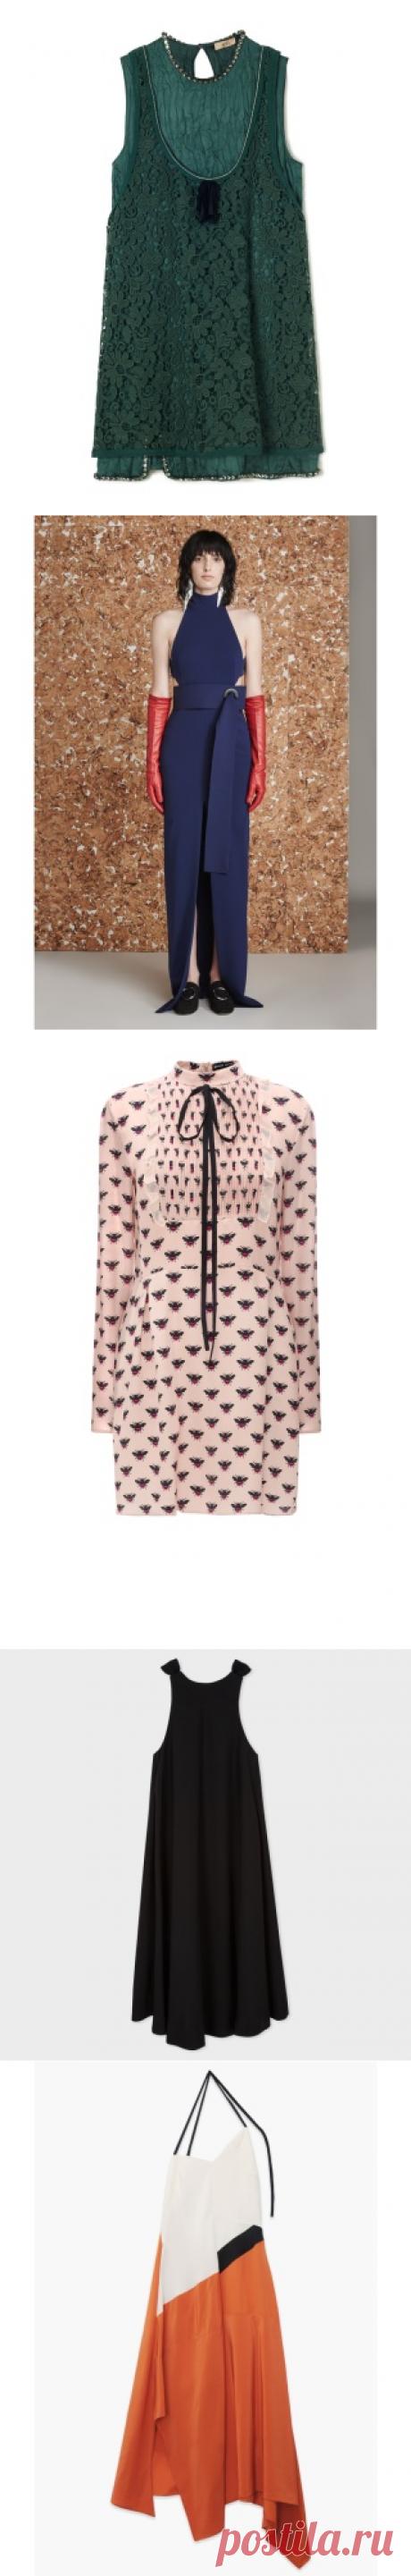 Women's Designer Dresses - Shop Online at Style.com